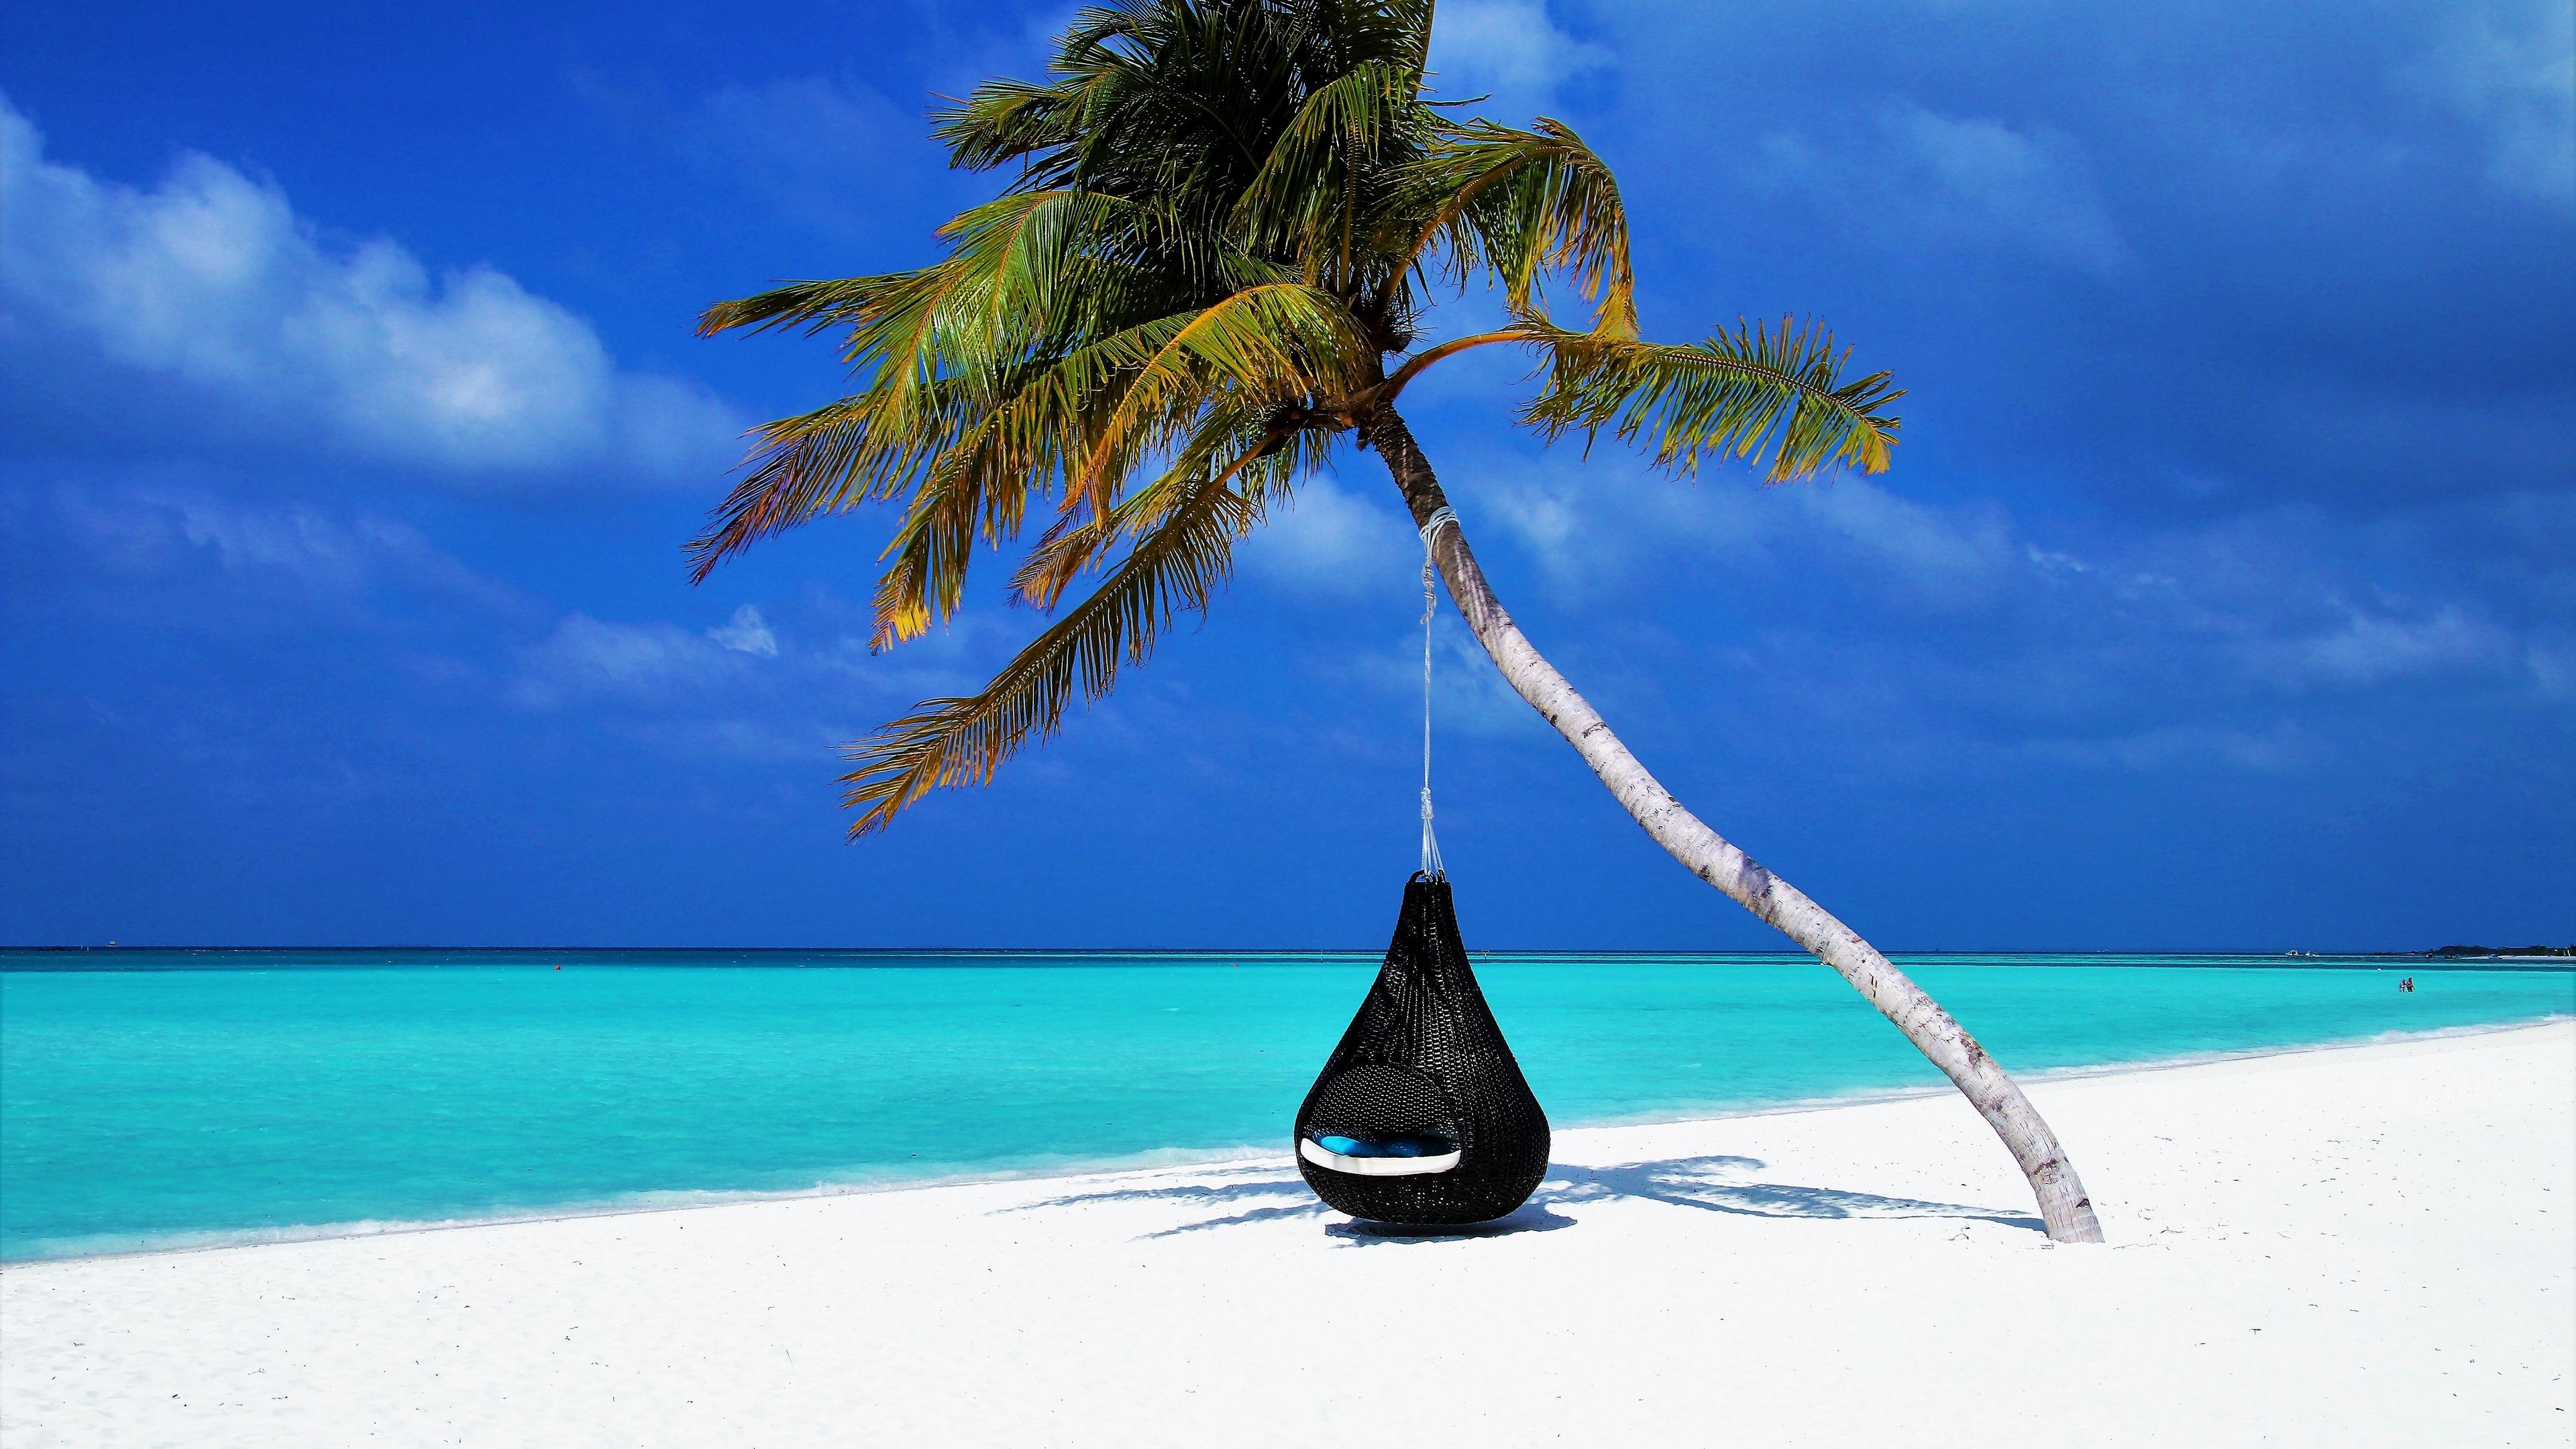 maldives palm beach relax rest ocean sand resort 4k 1541115167 - maldives, palm, beach, relax, rest, ocean, sand, resort 4k - Palm, Maldives, Beach